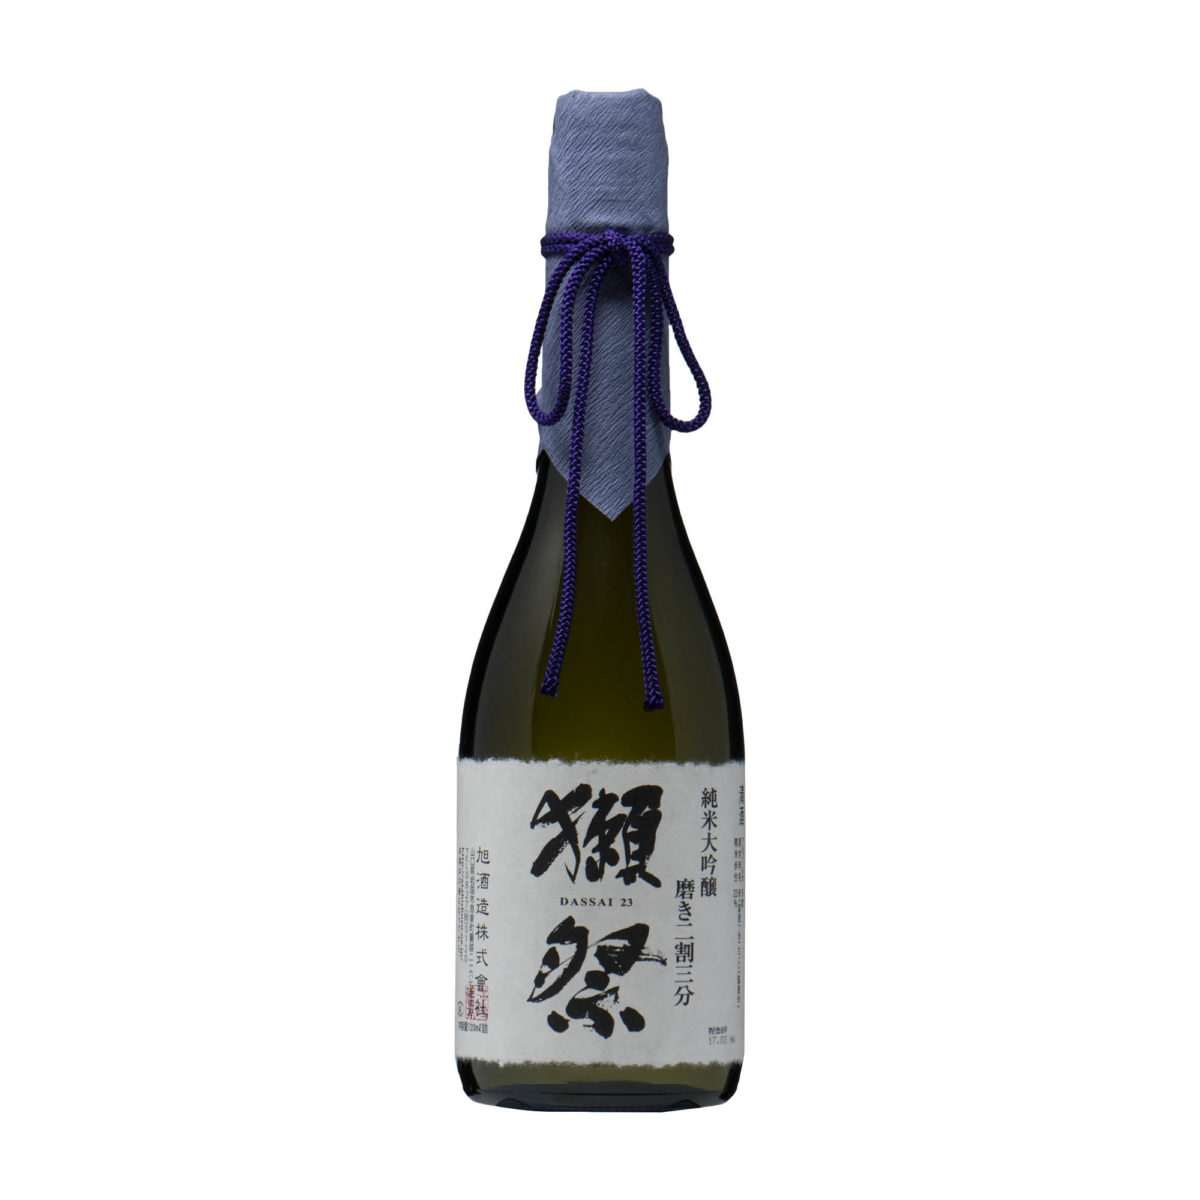 saké japonais Dassai23 junmai daiginjo